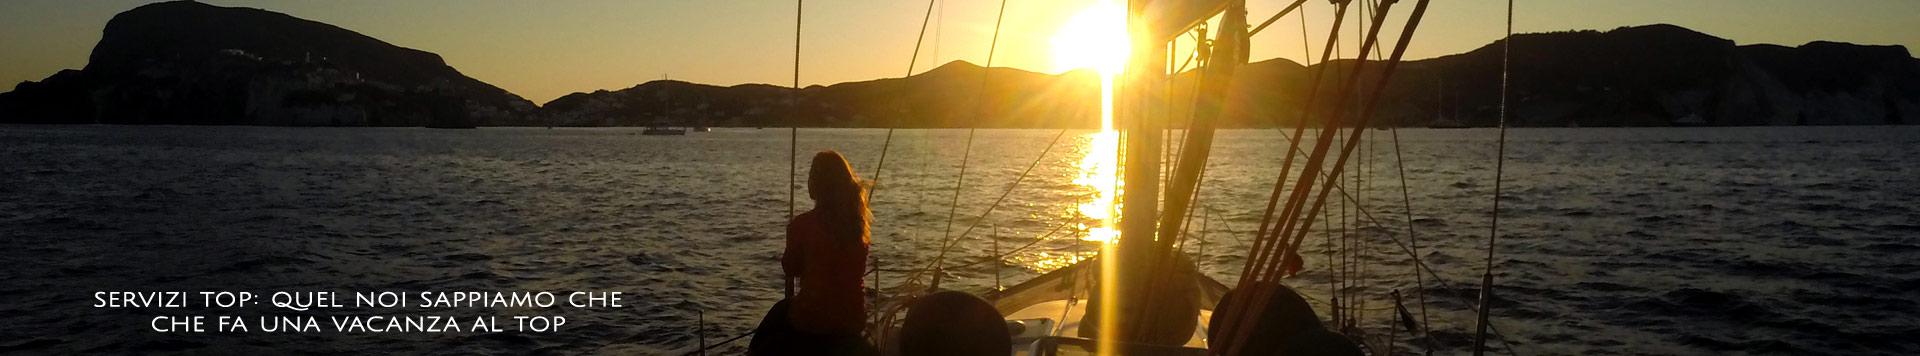 servizi top in barca a vela